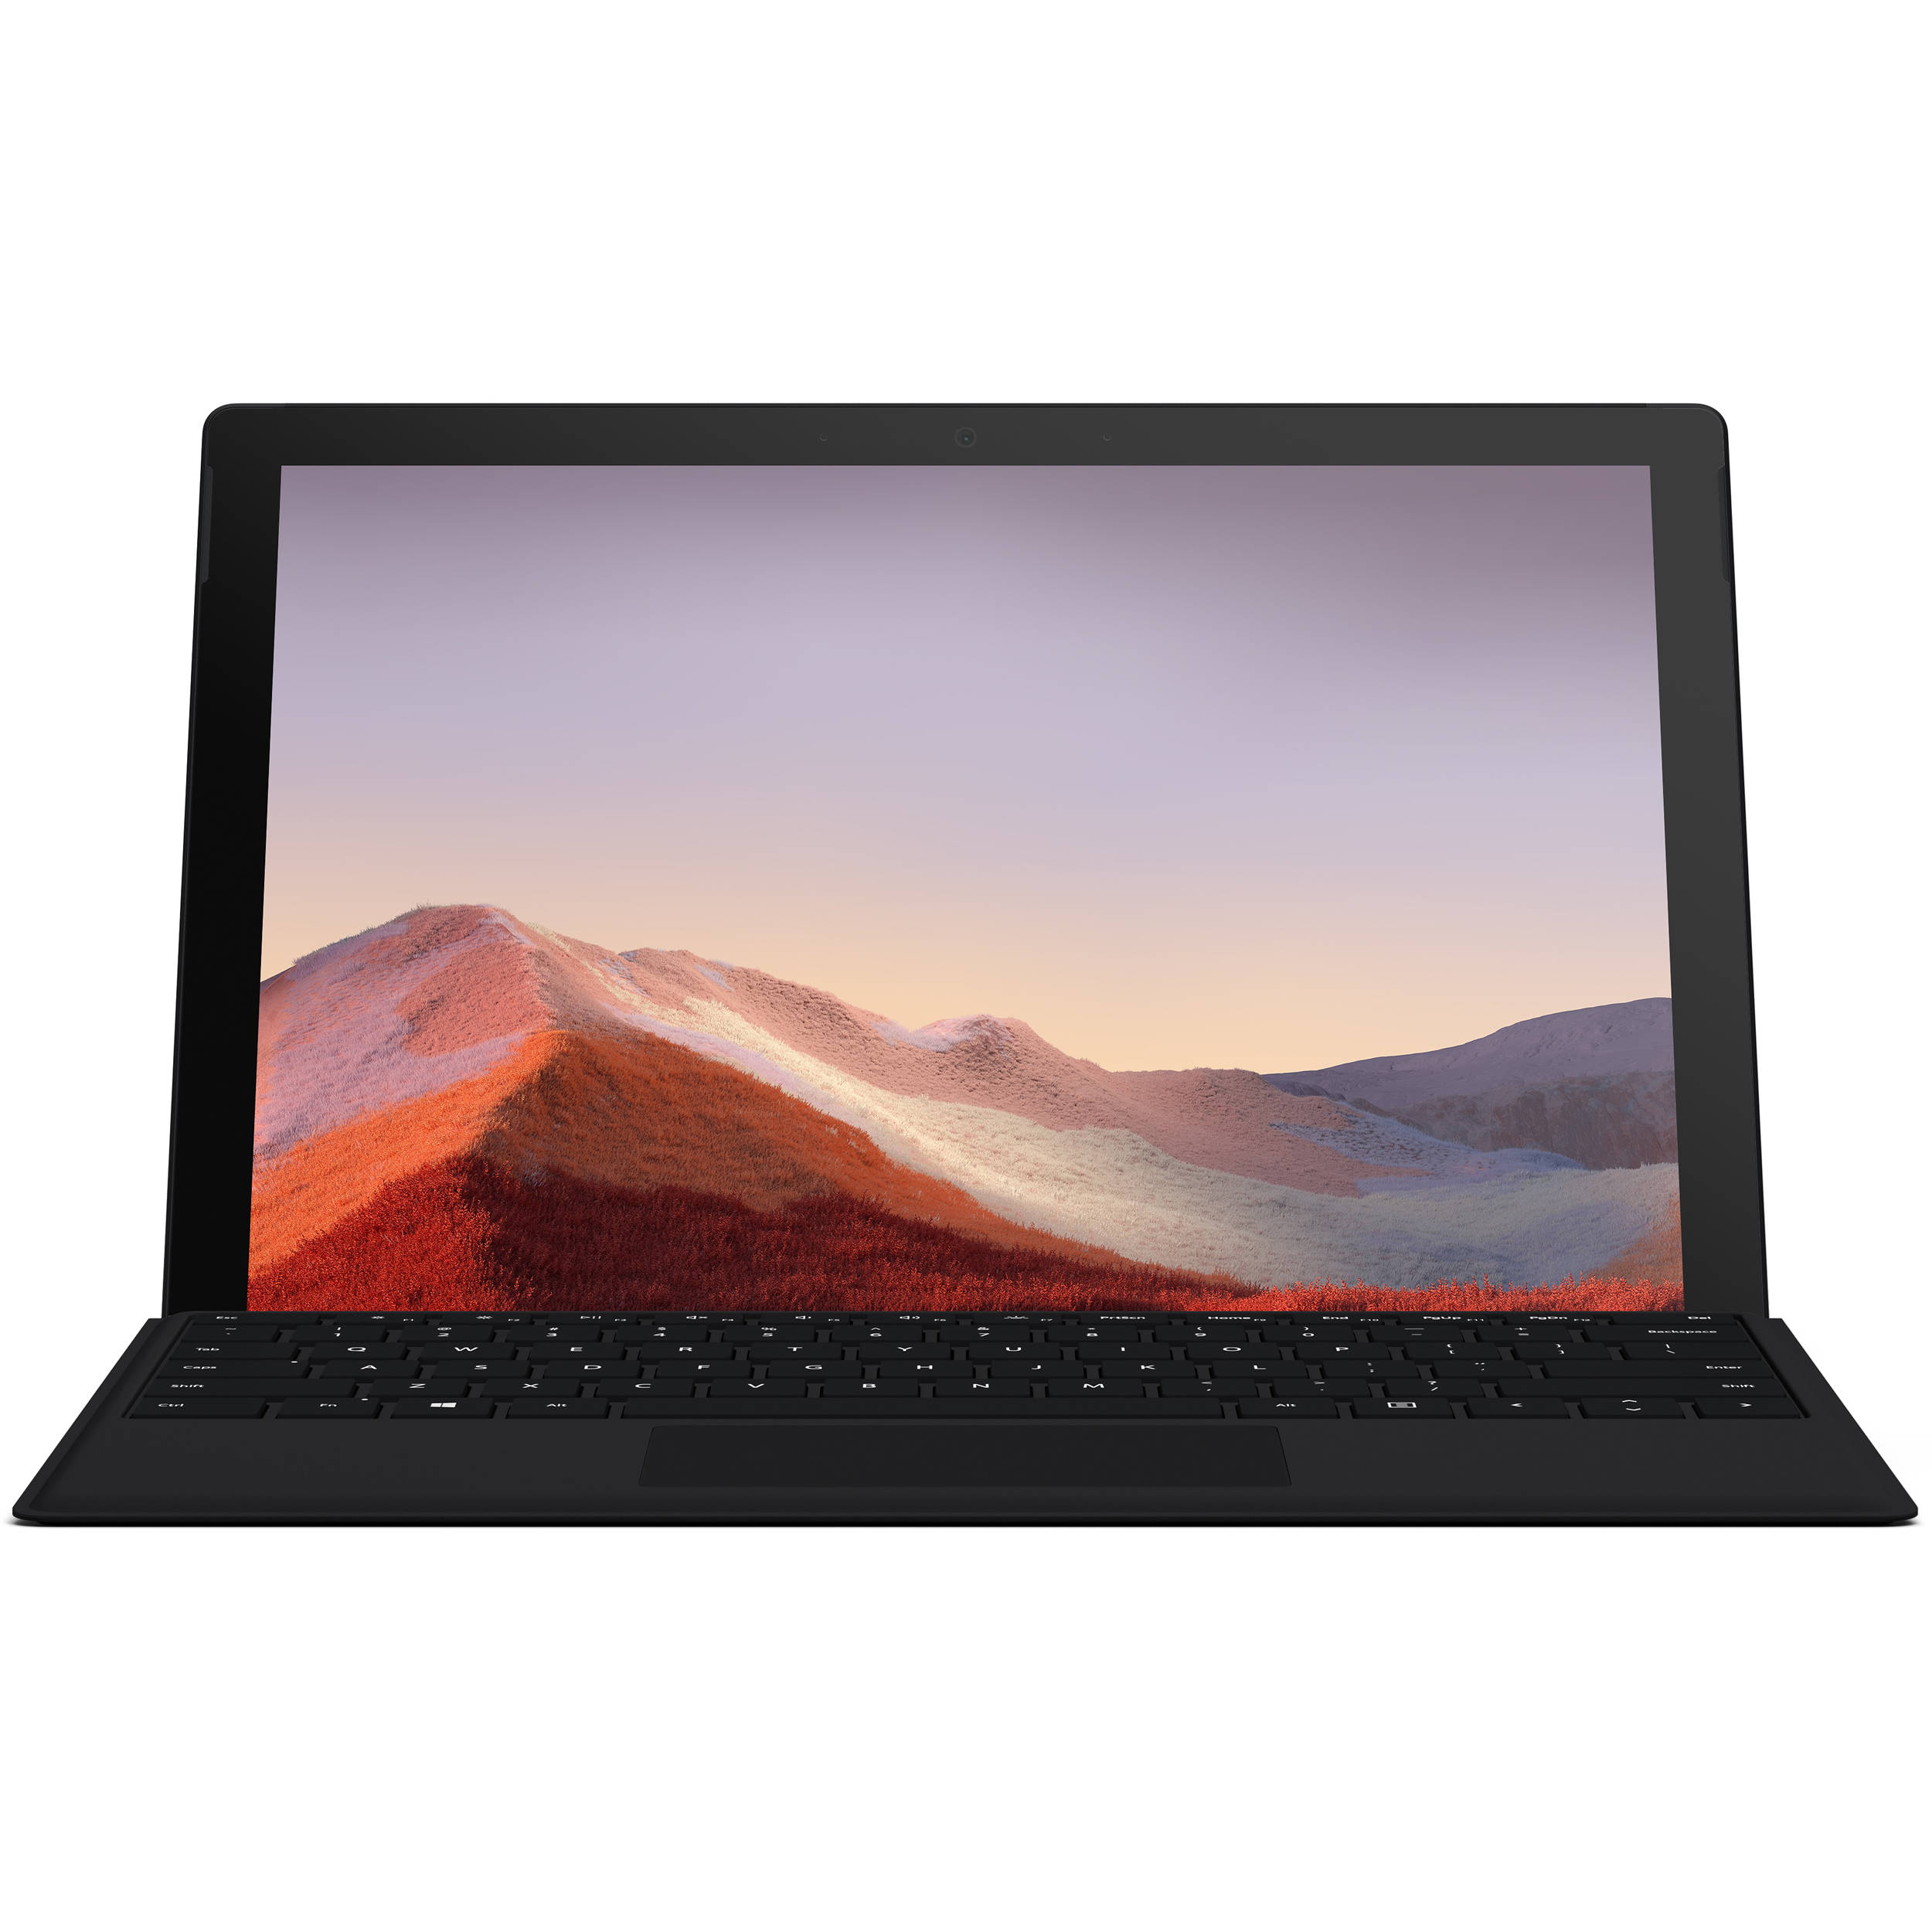 تصویر تبلت مایکروسافت مدل Surface Pro 7 - C به همراه کیبورد Black Type Cover Microsoft Surface Pro 7 - C - Tablet With Black Type Cover Keyboard